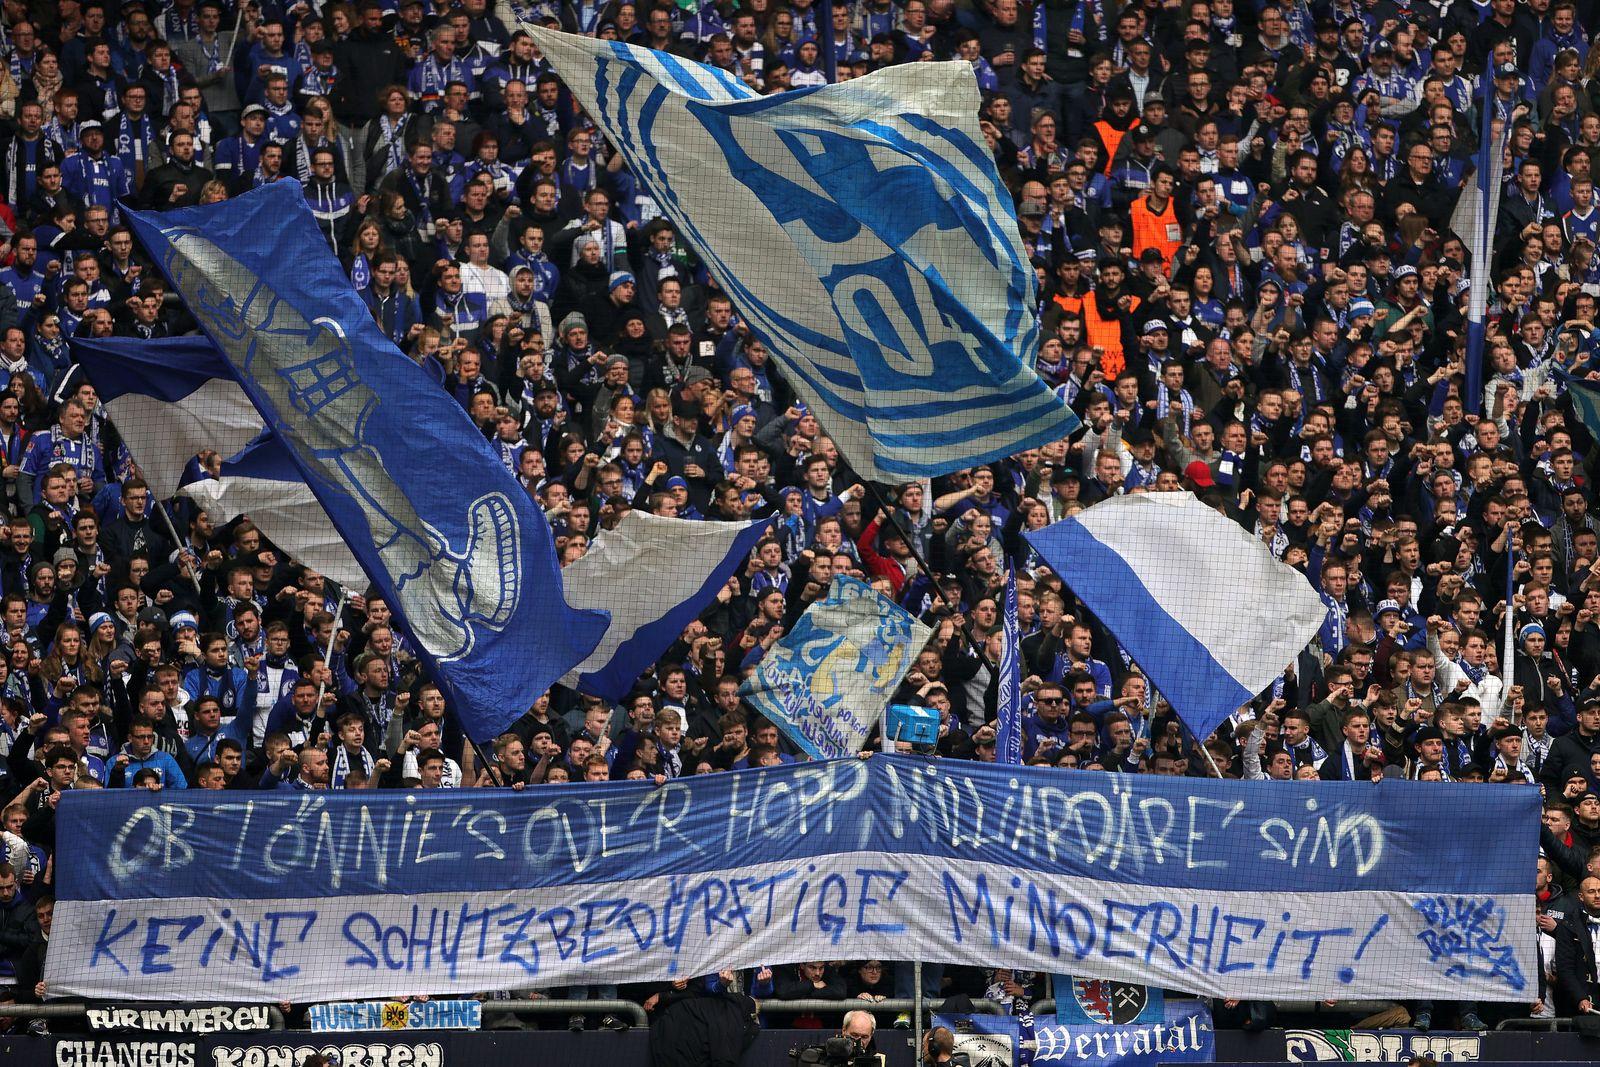 FC Schalke 04 vs TSG 1899 Hoffenheim, Gelsenkirchen, Germany - 07 Mar 2020